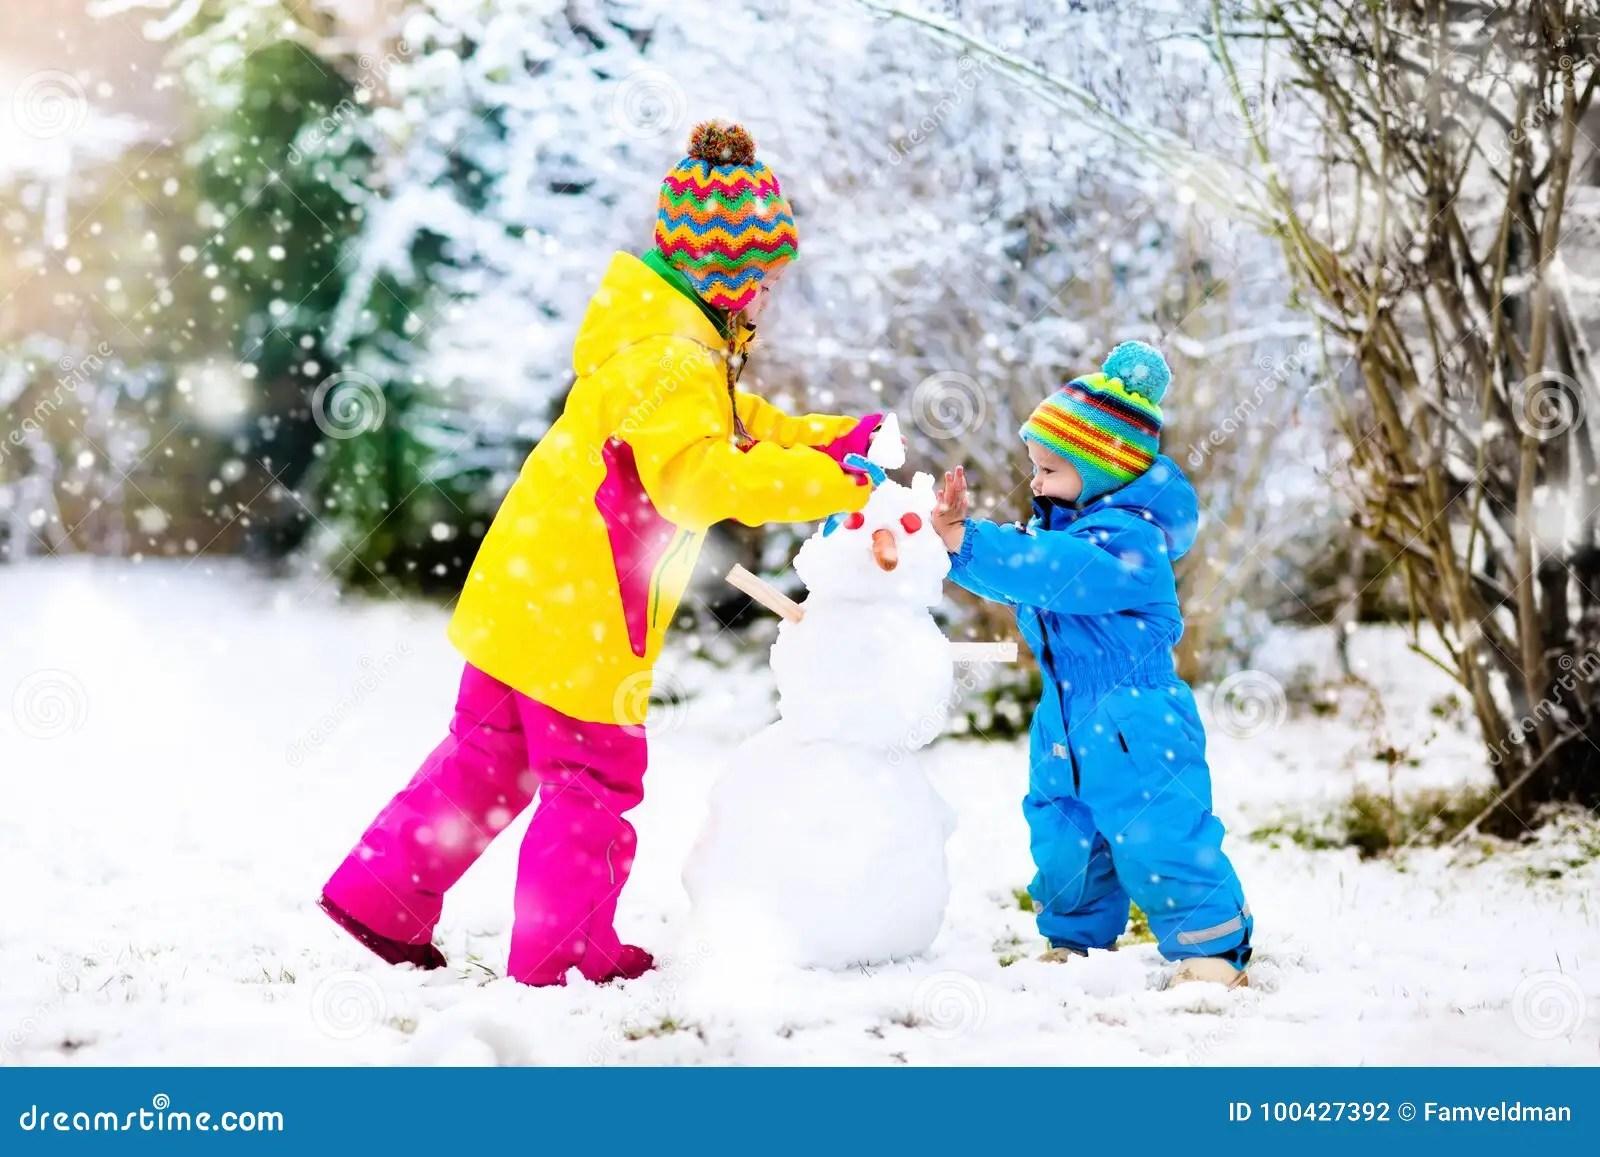 Kids Building Snowman Children In Snow Winter Fun Stock